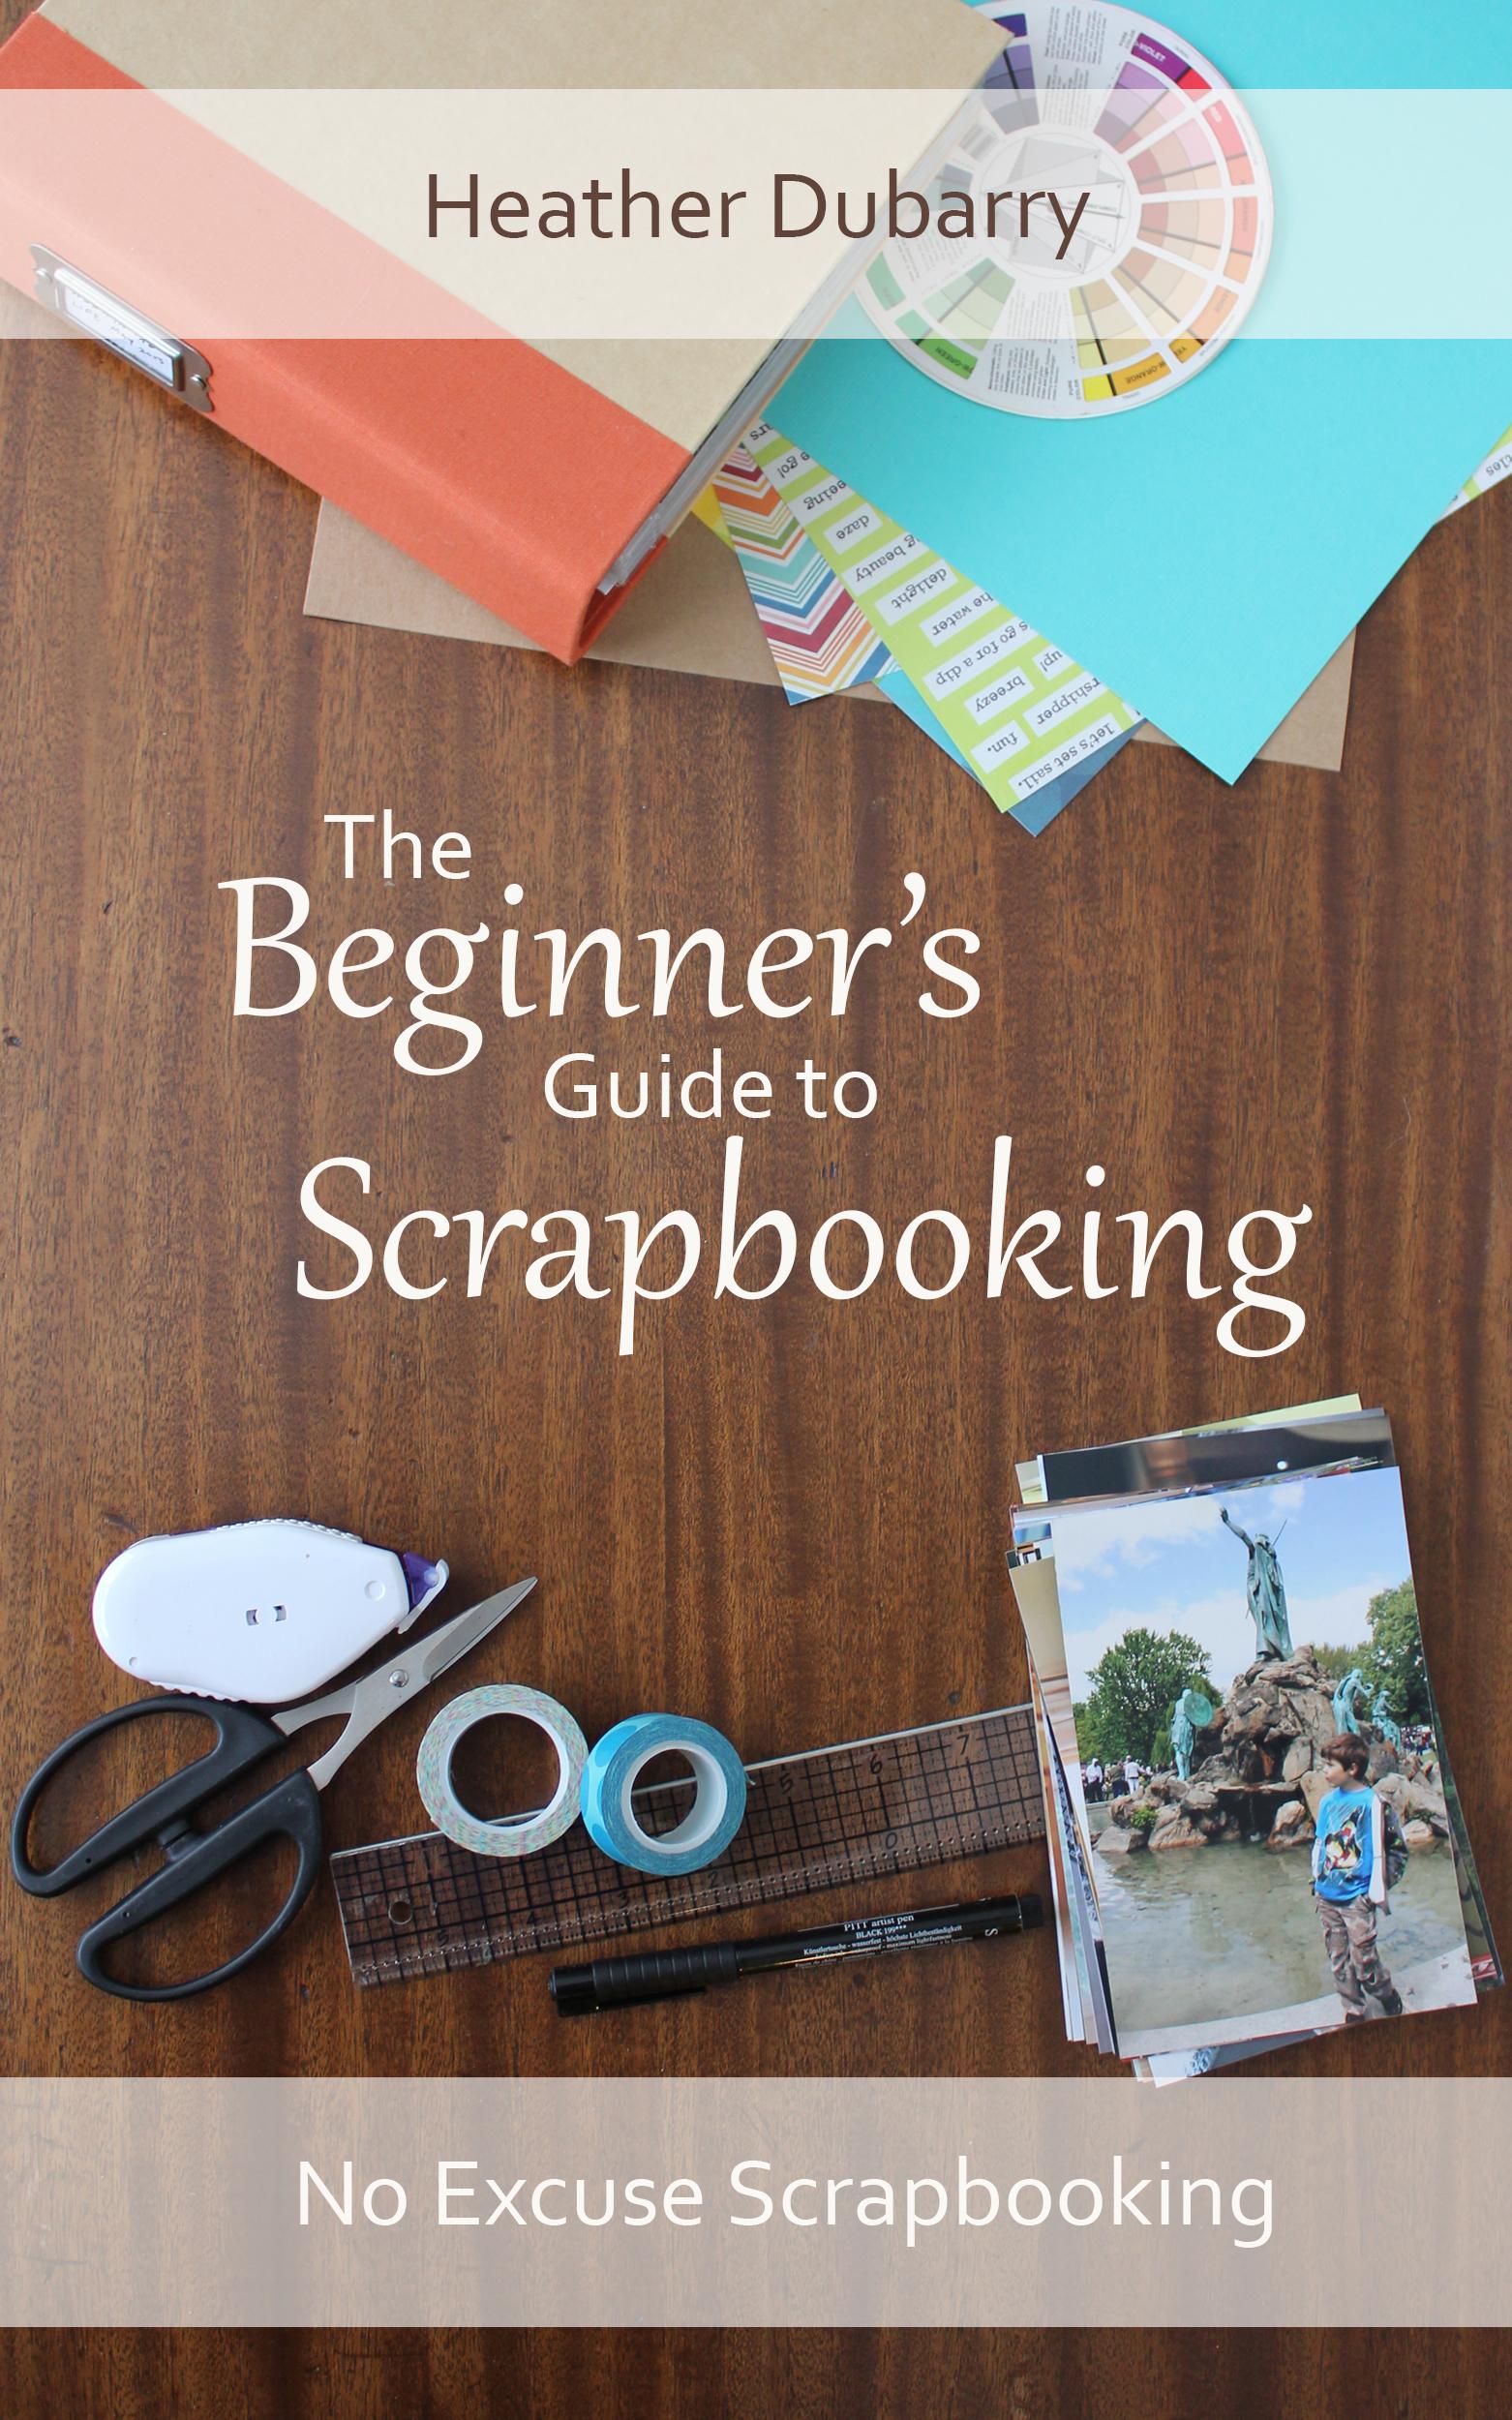 How to scrapbook photos - Let Me Show You How